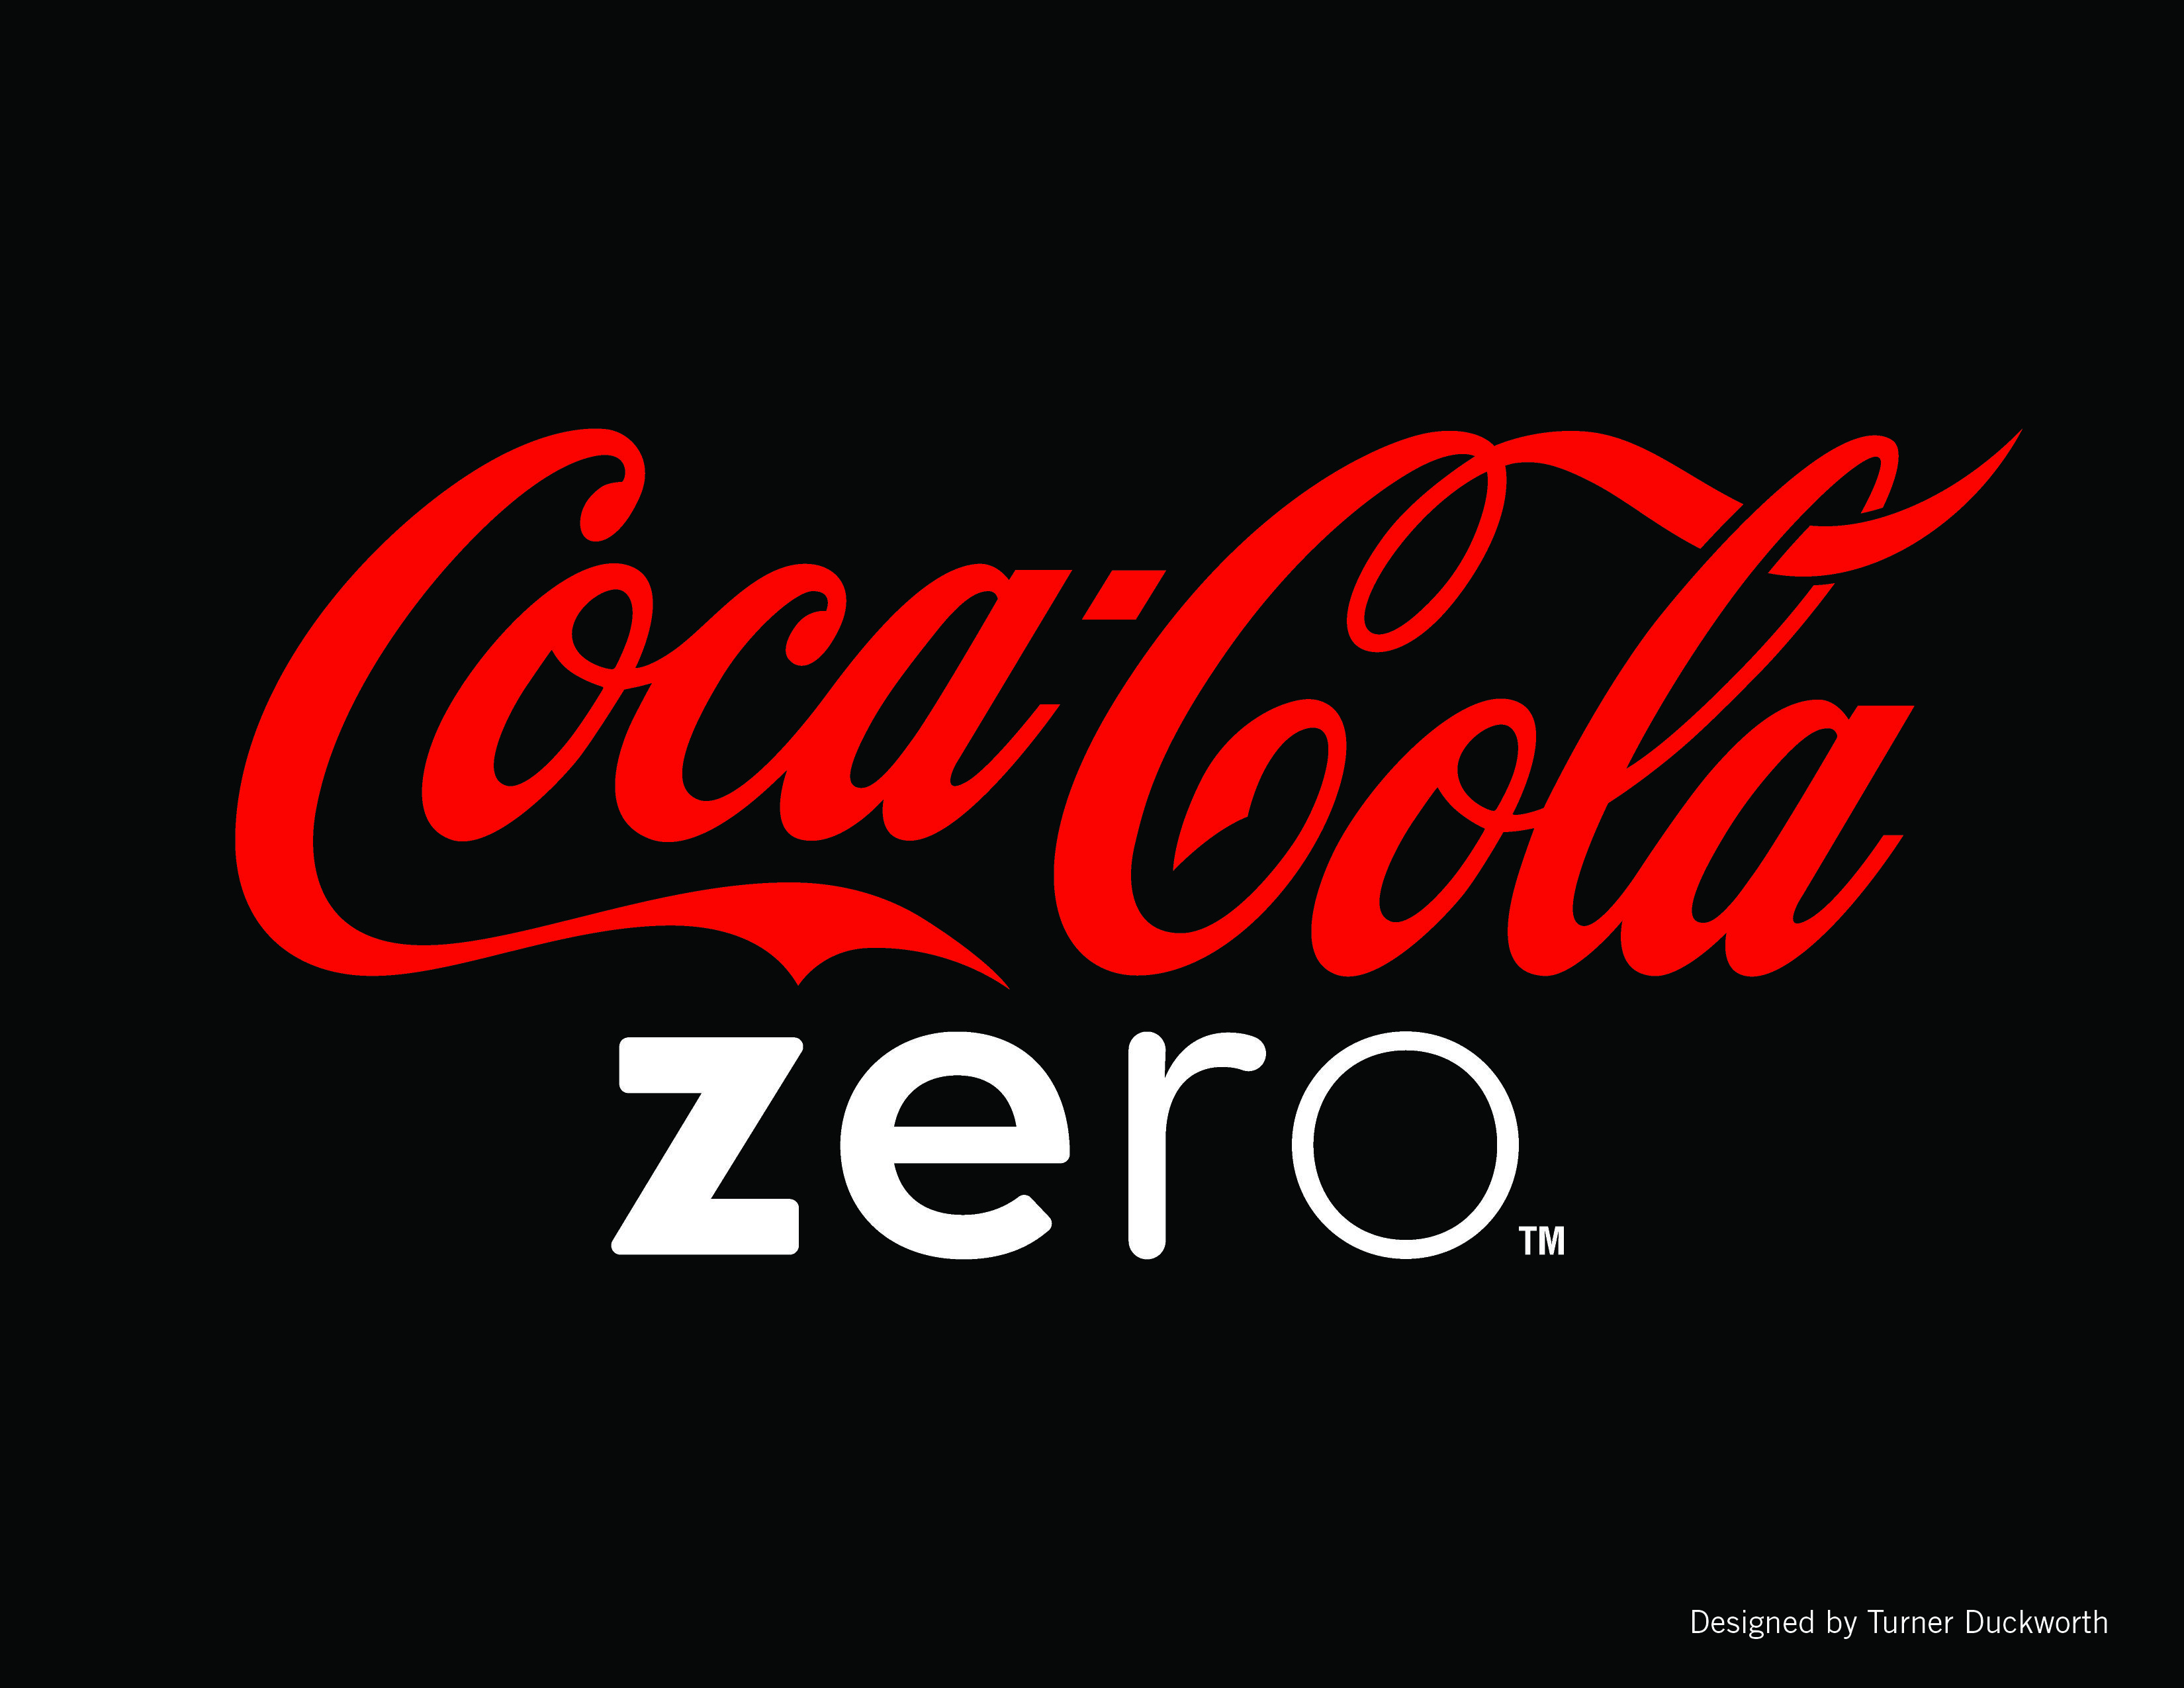 Coca Cola ZERO Logo Design By Turner Duckworth